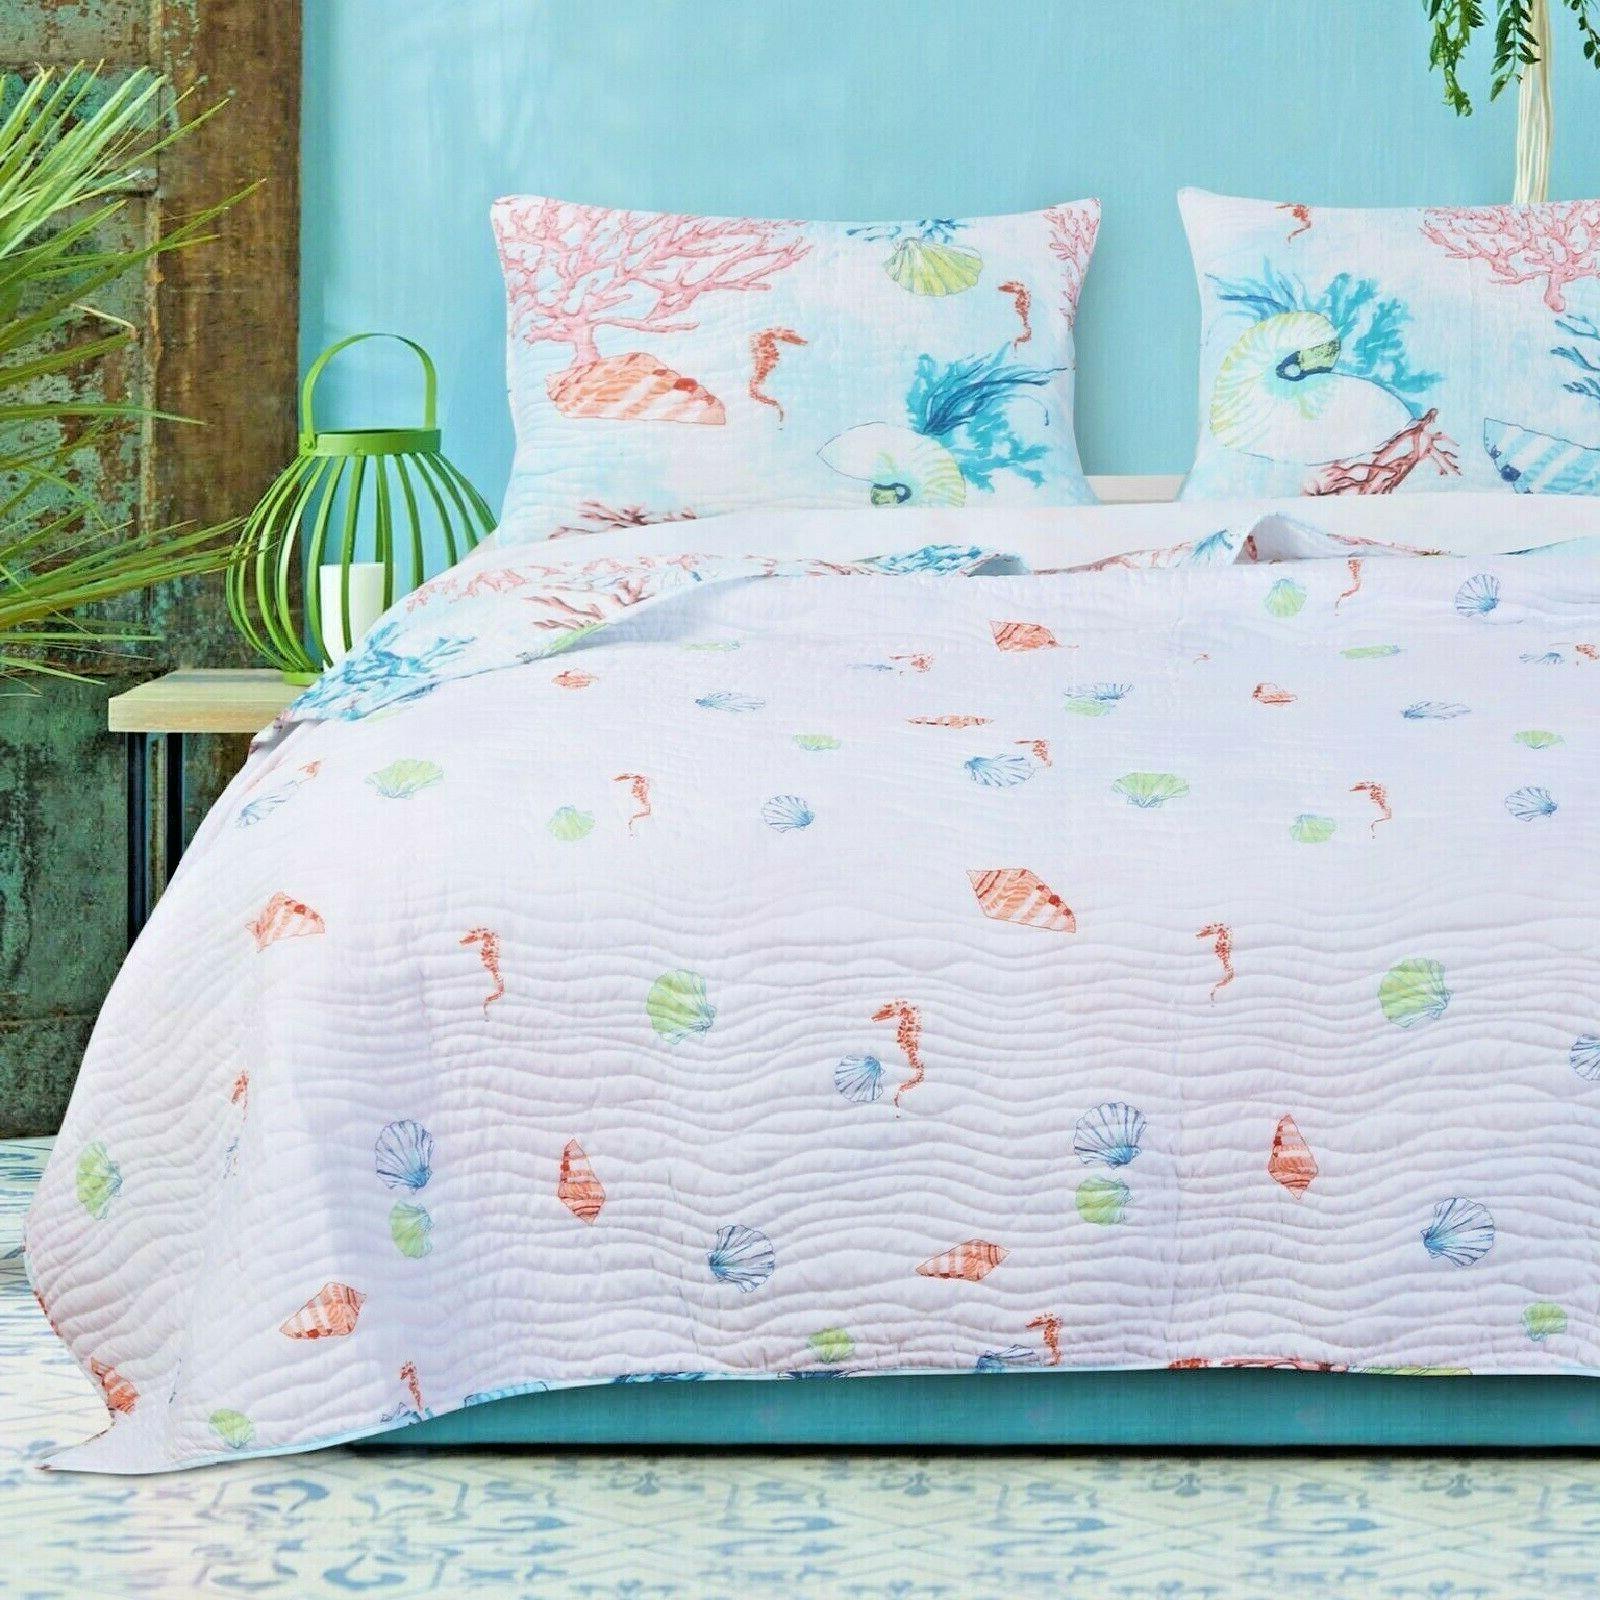 Quilt Set Queen Bedding Multi